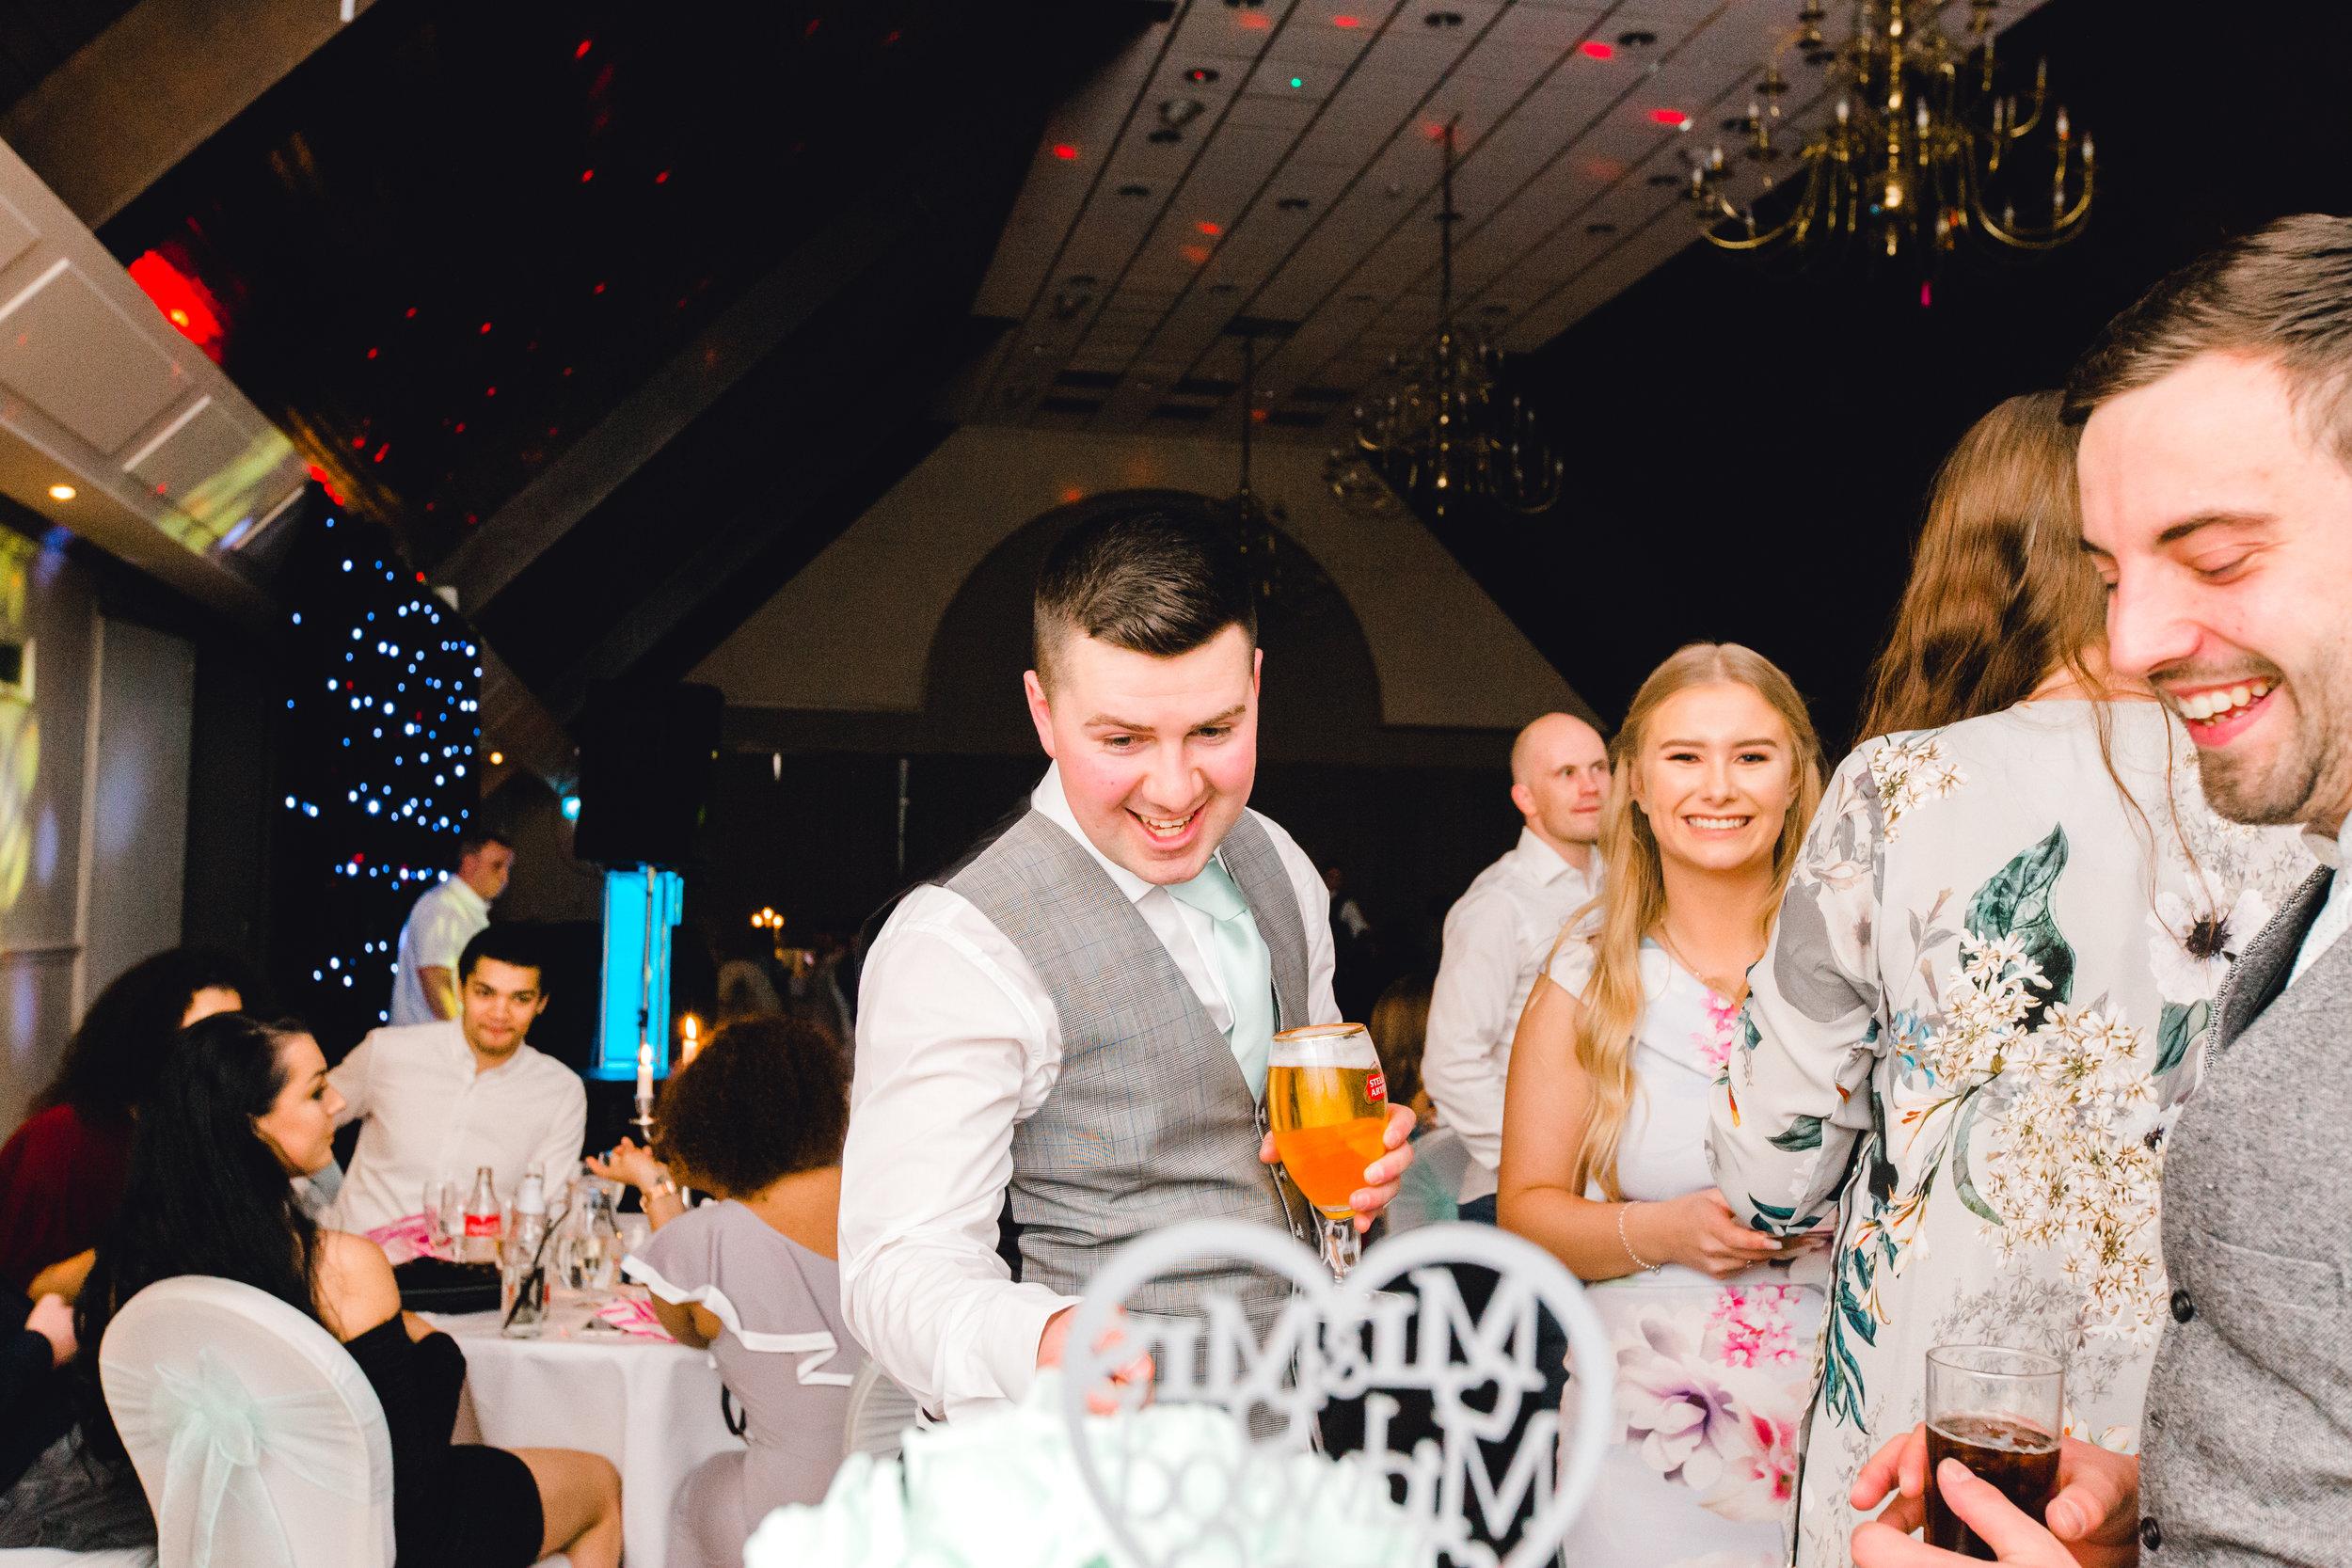 Cheeky best man pretending to cut the wedding cake